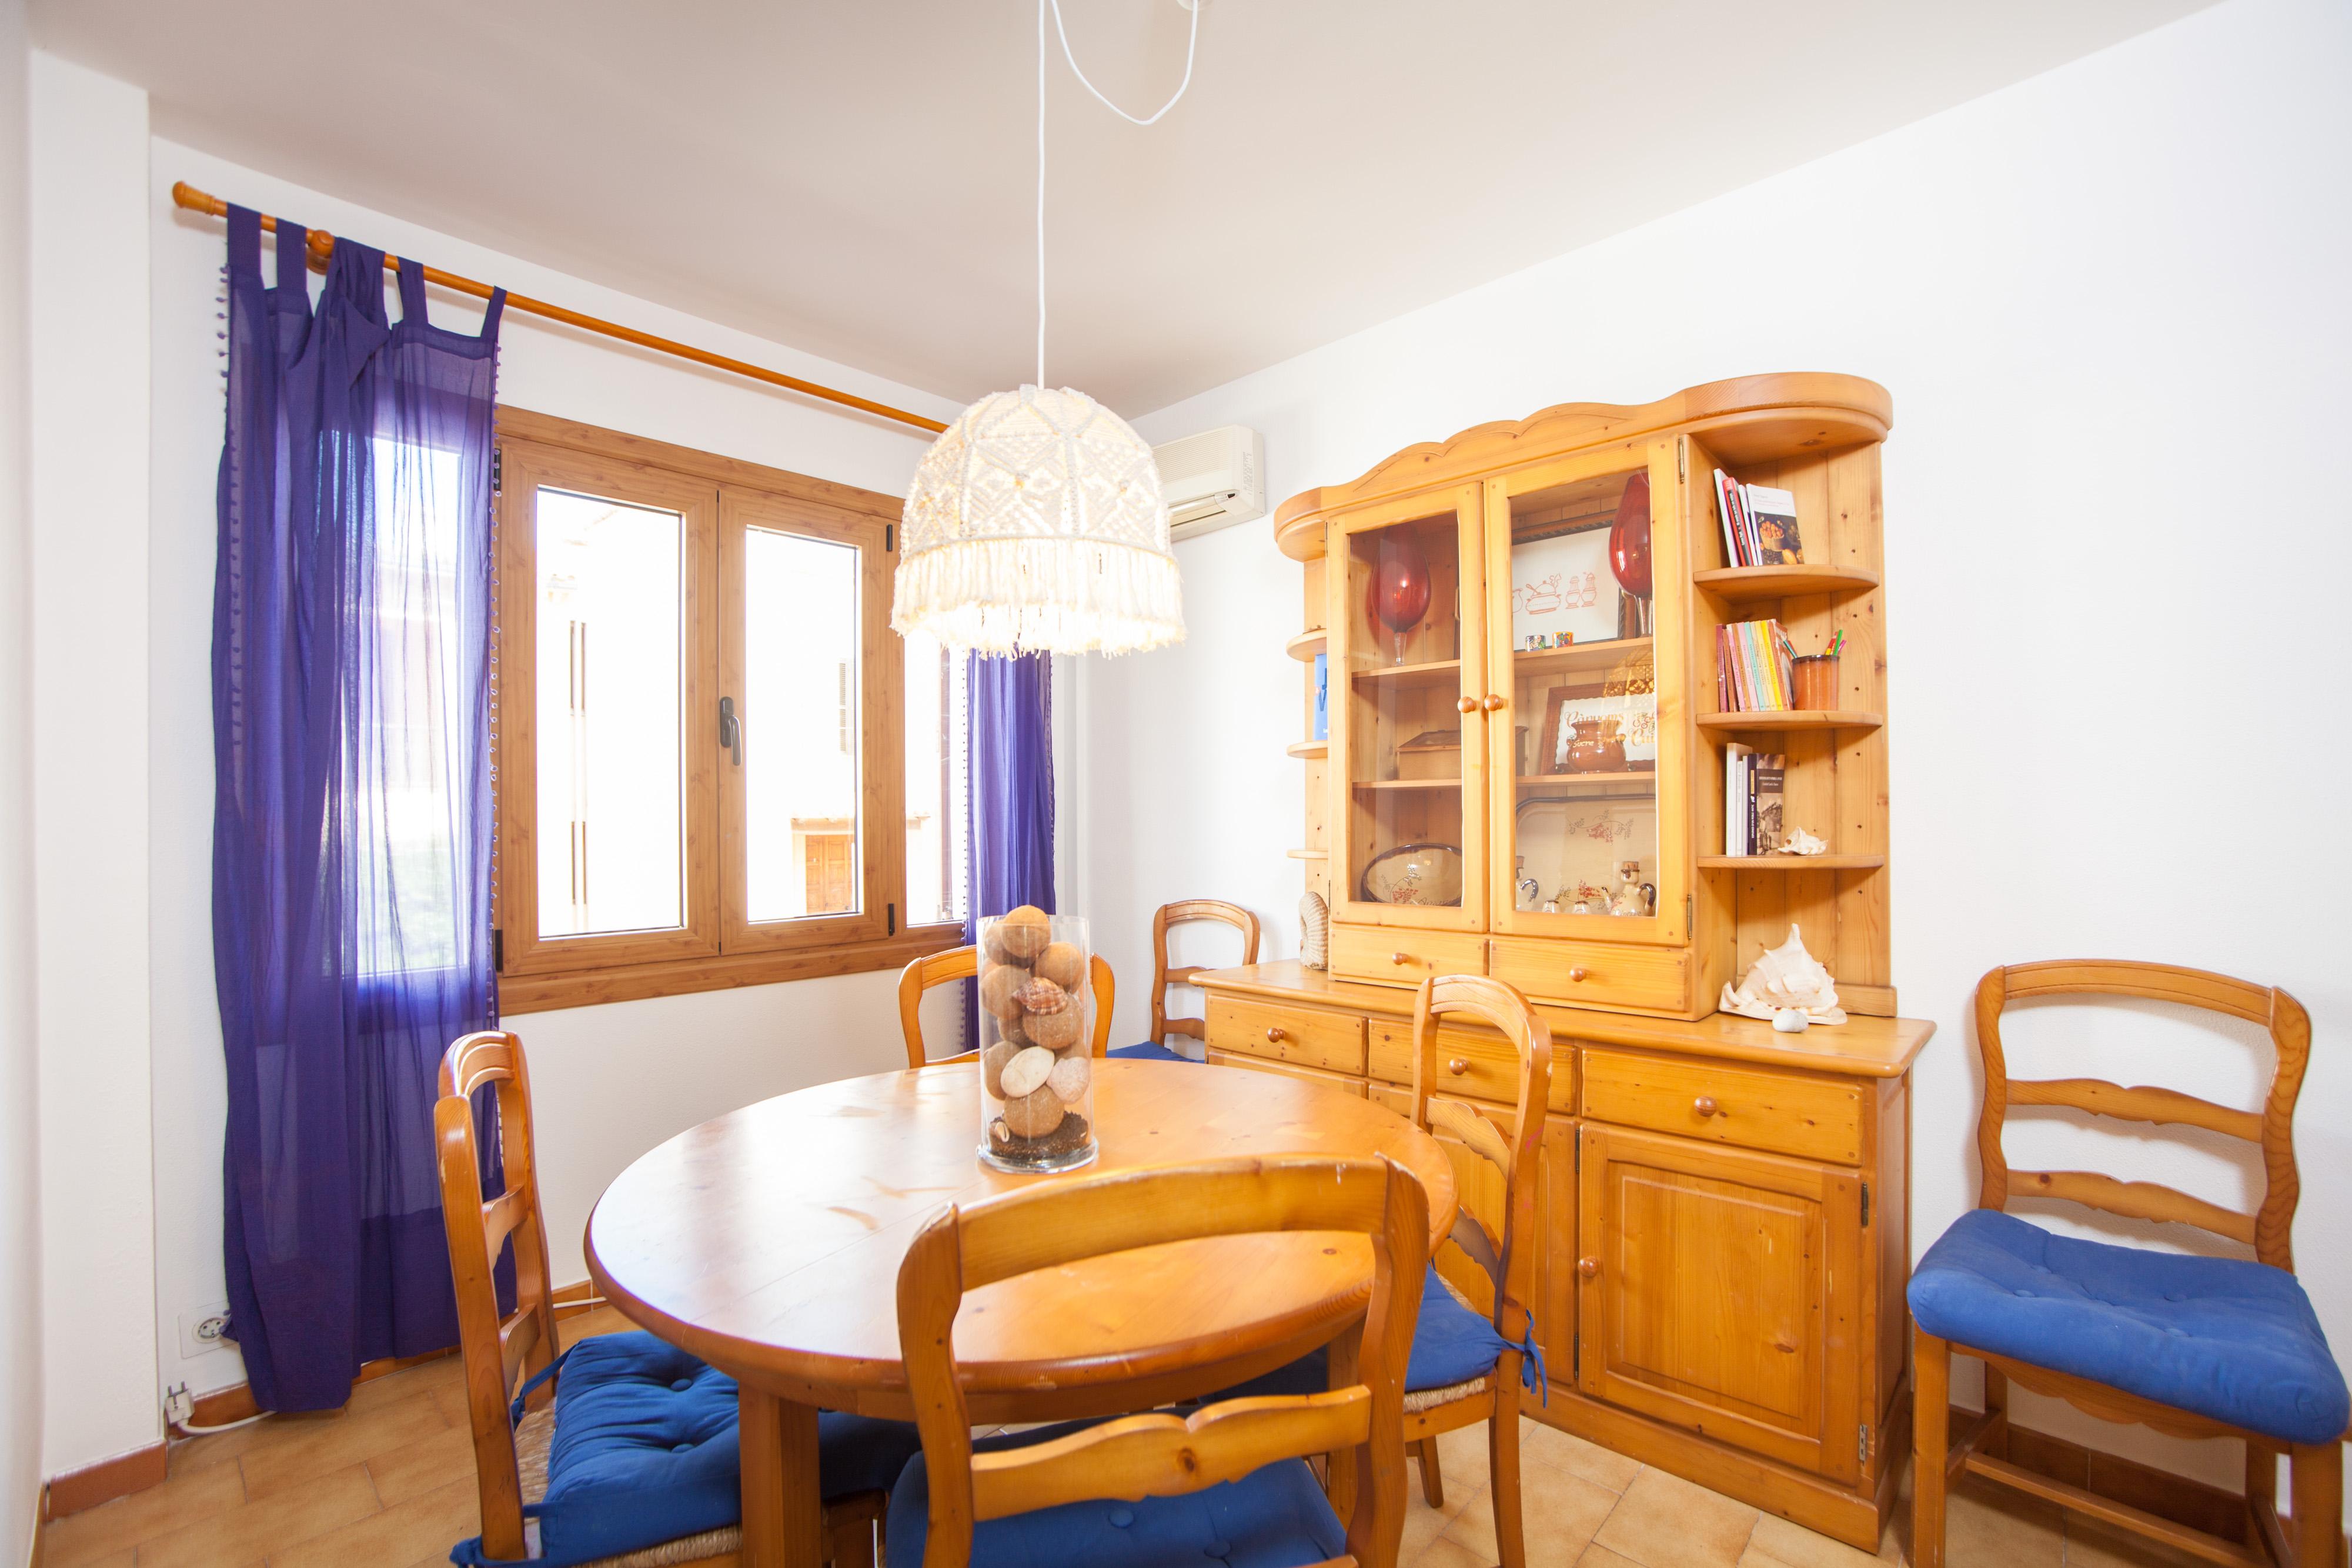 Ferienhaus CAN CUSSÓ SANSÓ (2198042), Colonia de Sant Pere, Mallorca, Balearische Inseln, Spanien, Bild 10